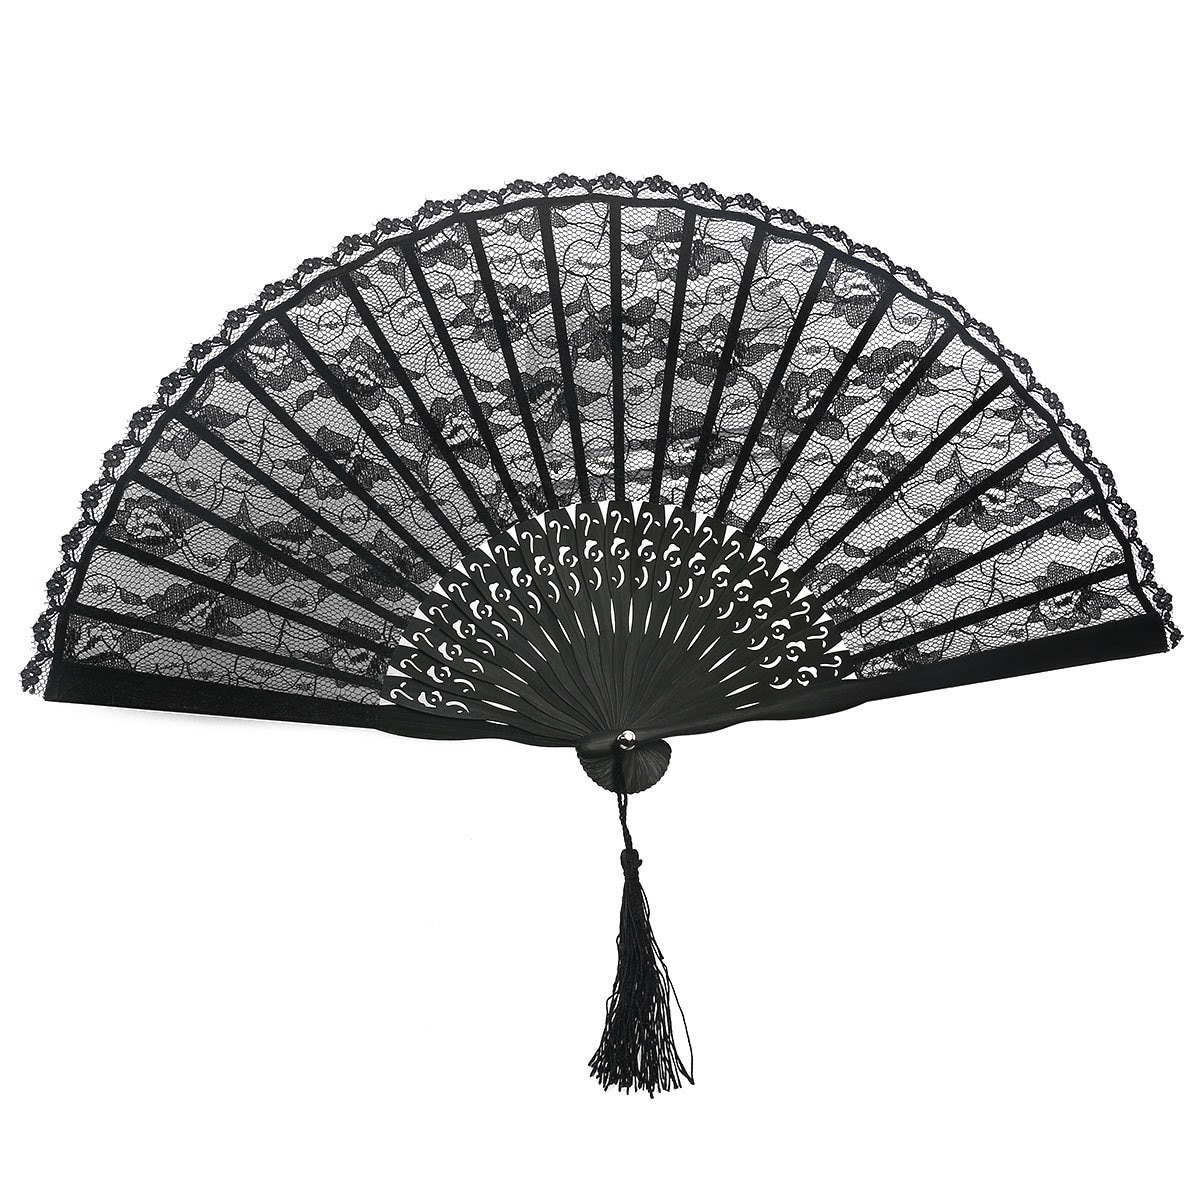 Abanico de baile español FEECOLOR, abanico victoriano para mujer, abanico plegado manual para boda, recuerdo de fiesta, accesorio de traje de baile elegante (negro)